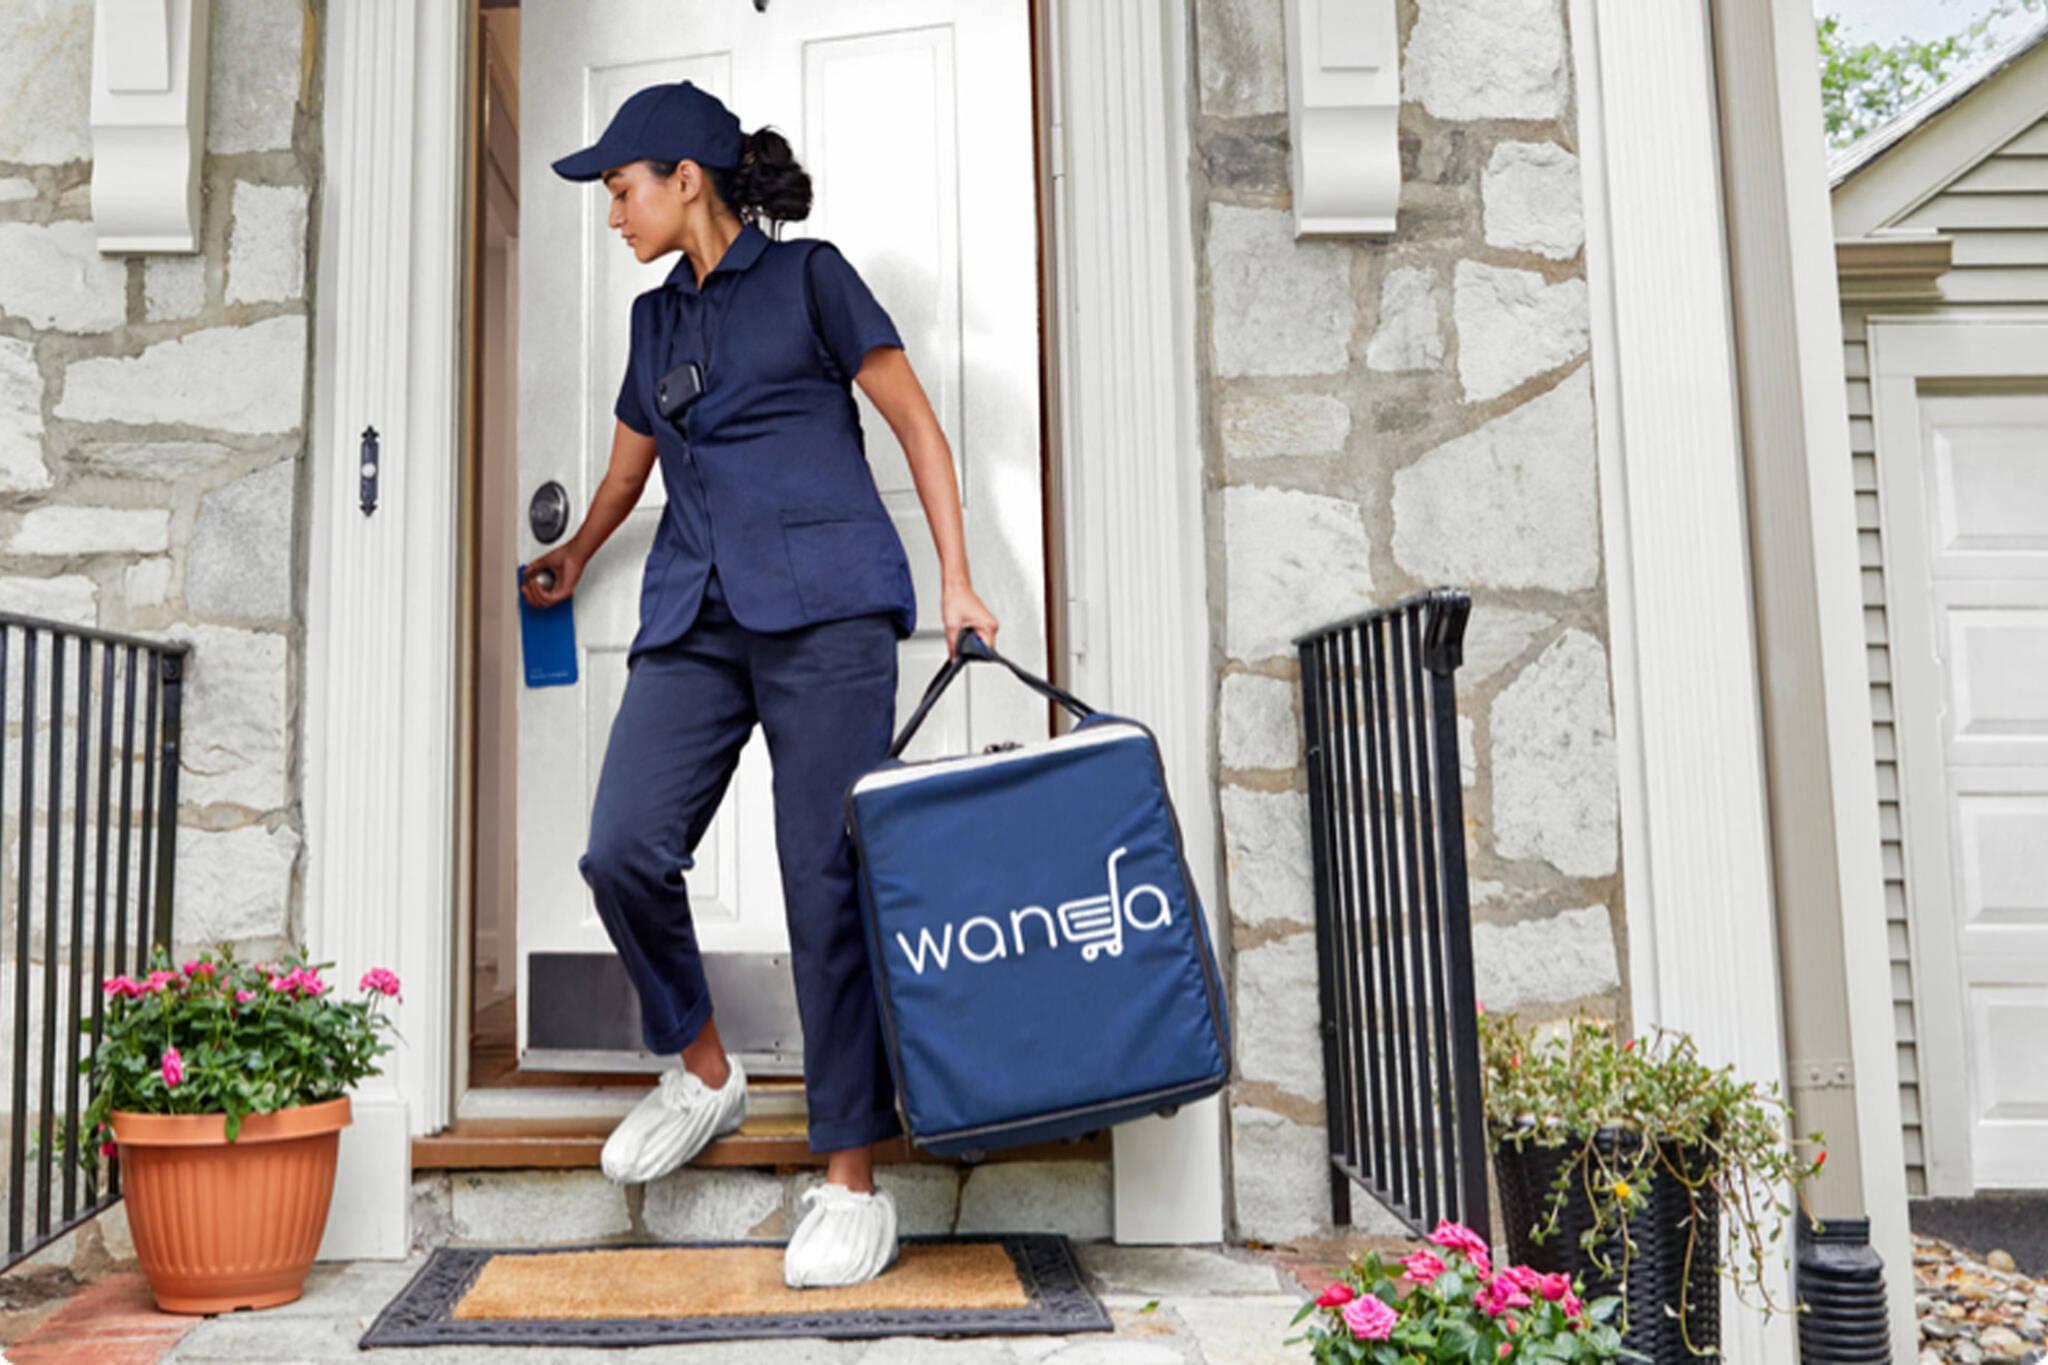 wanda delivery toronto